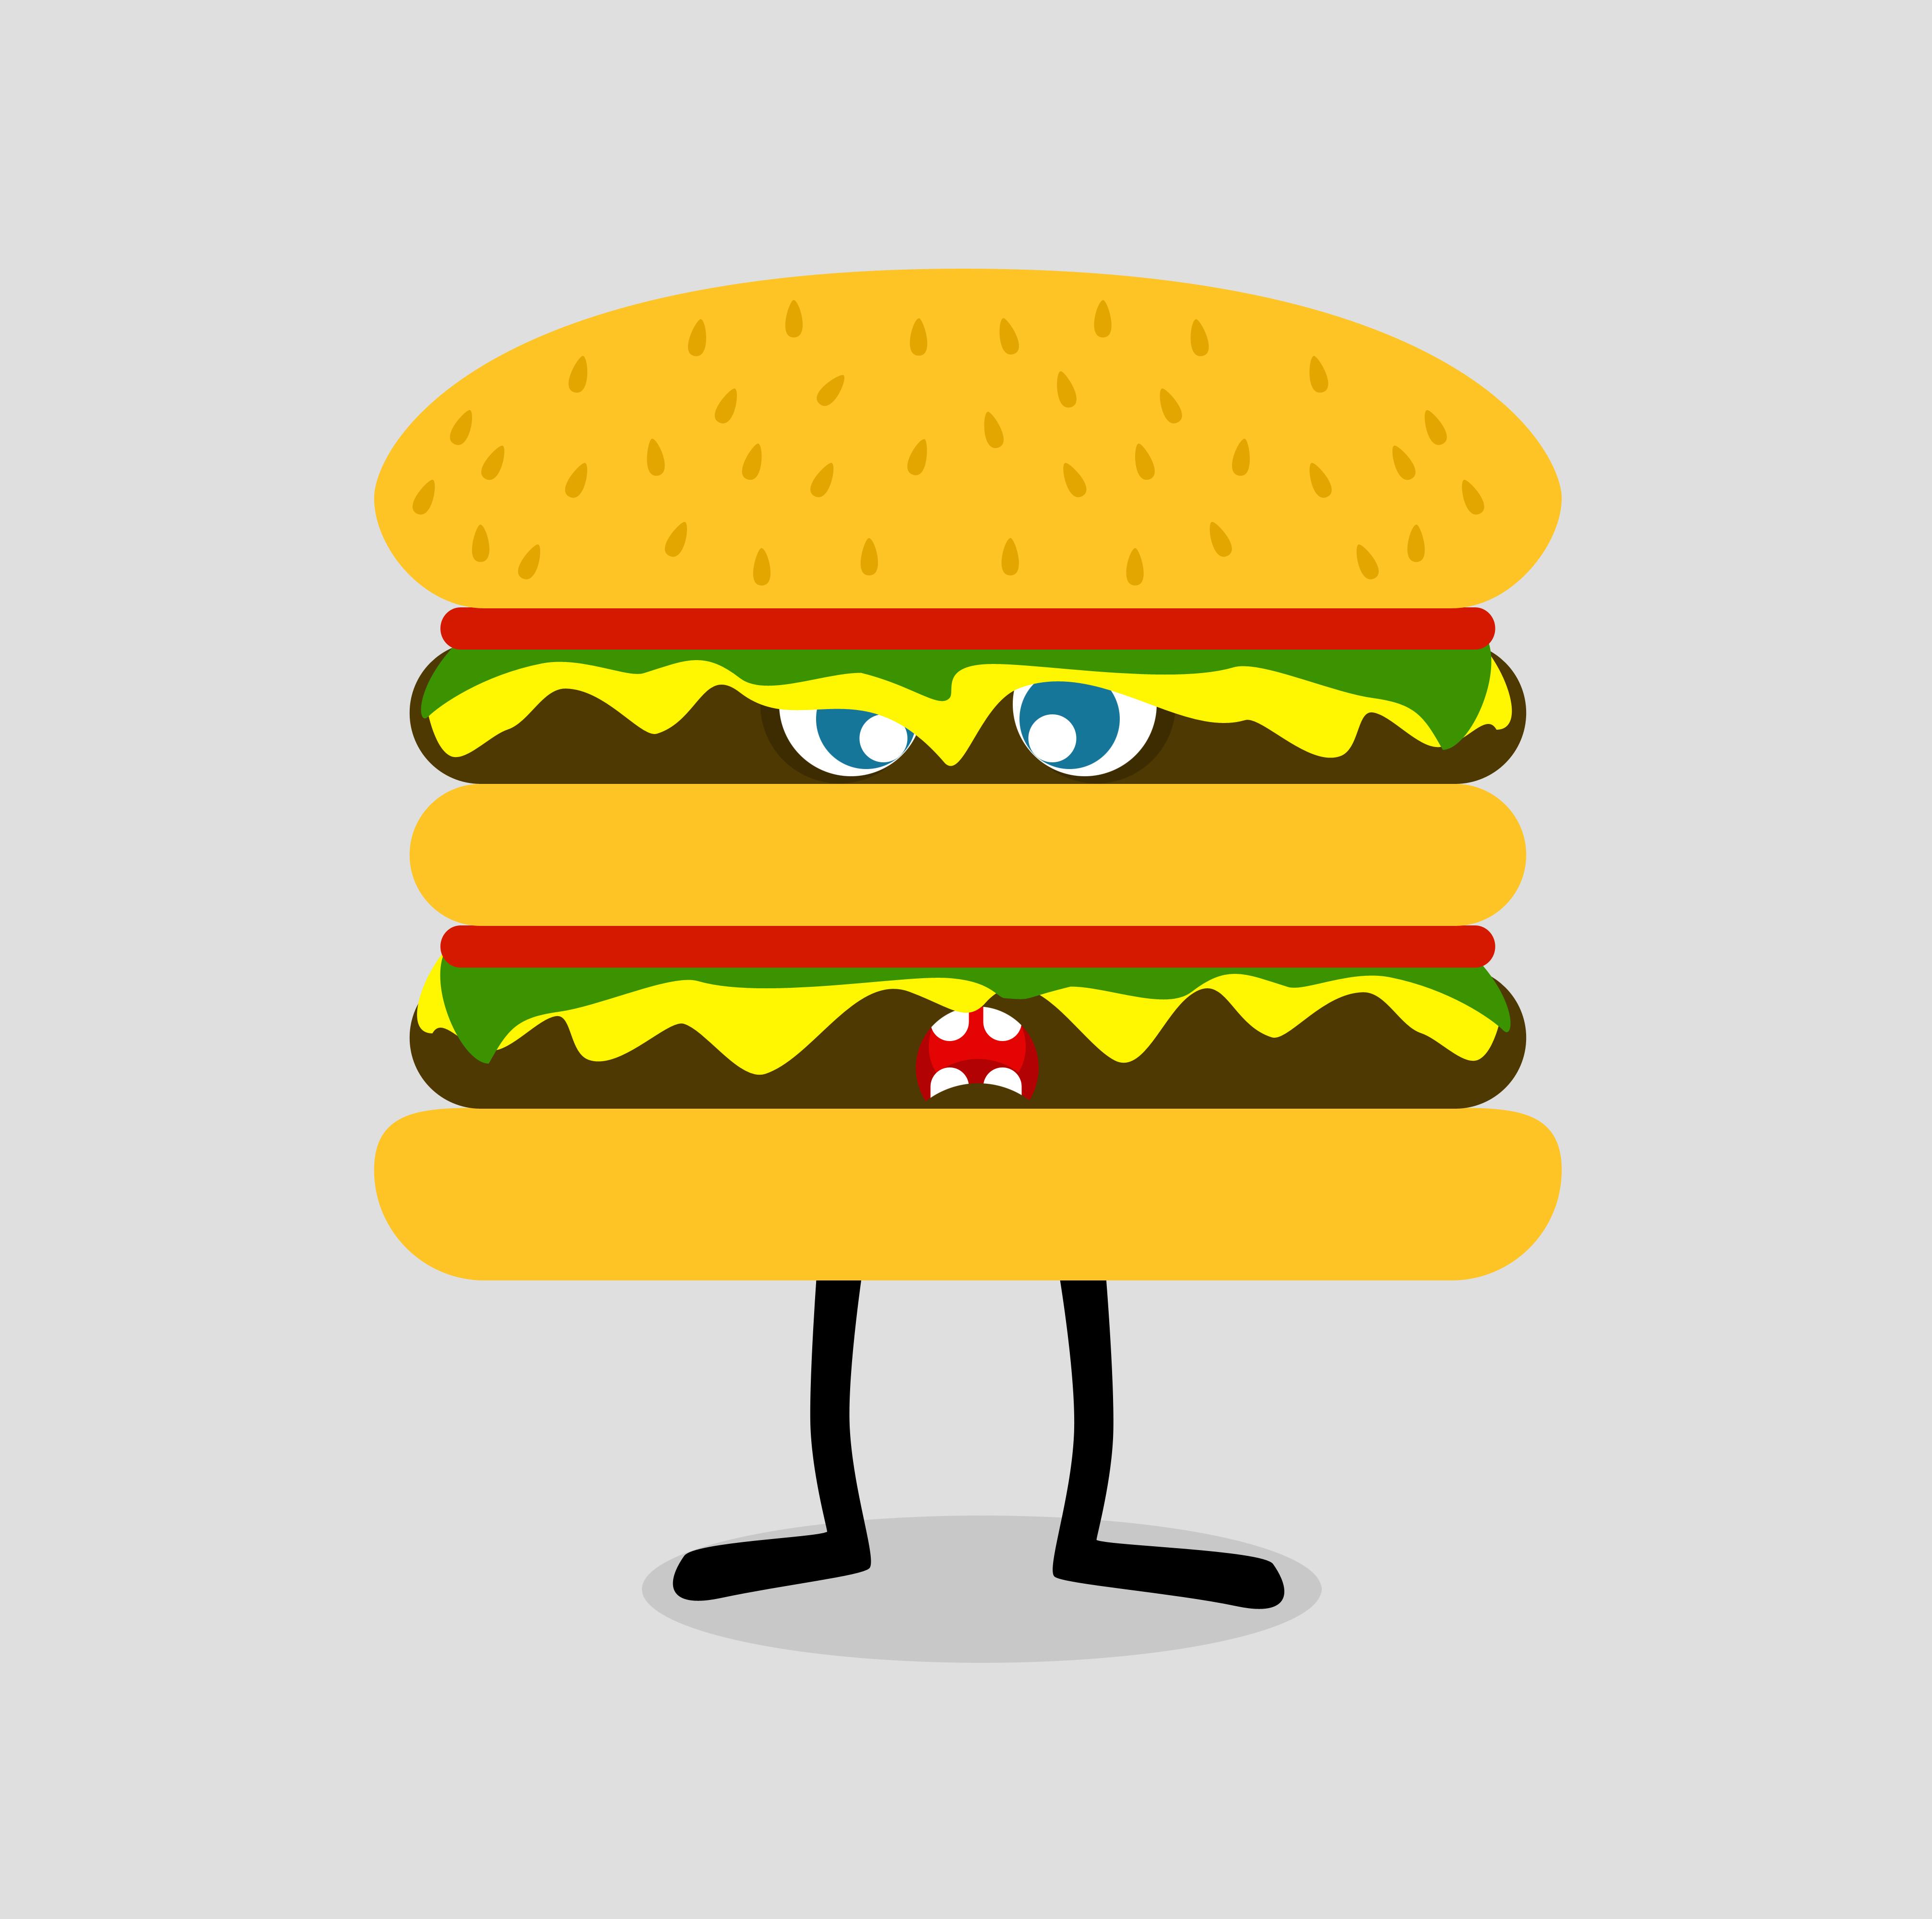 Mr Burger is angry   Lablob.com